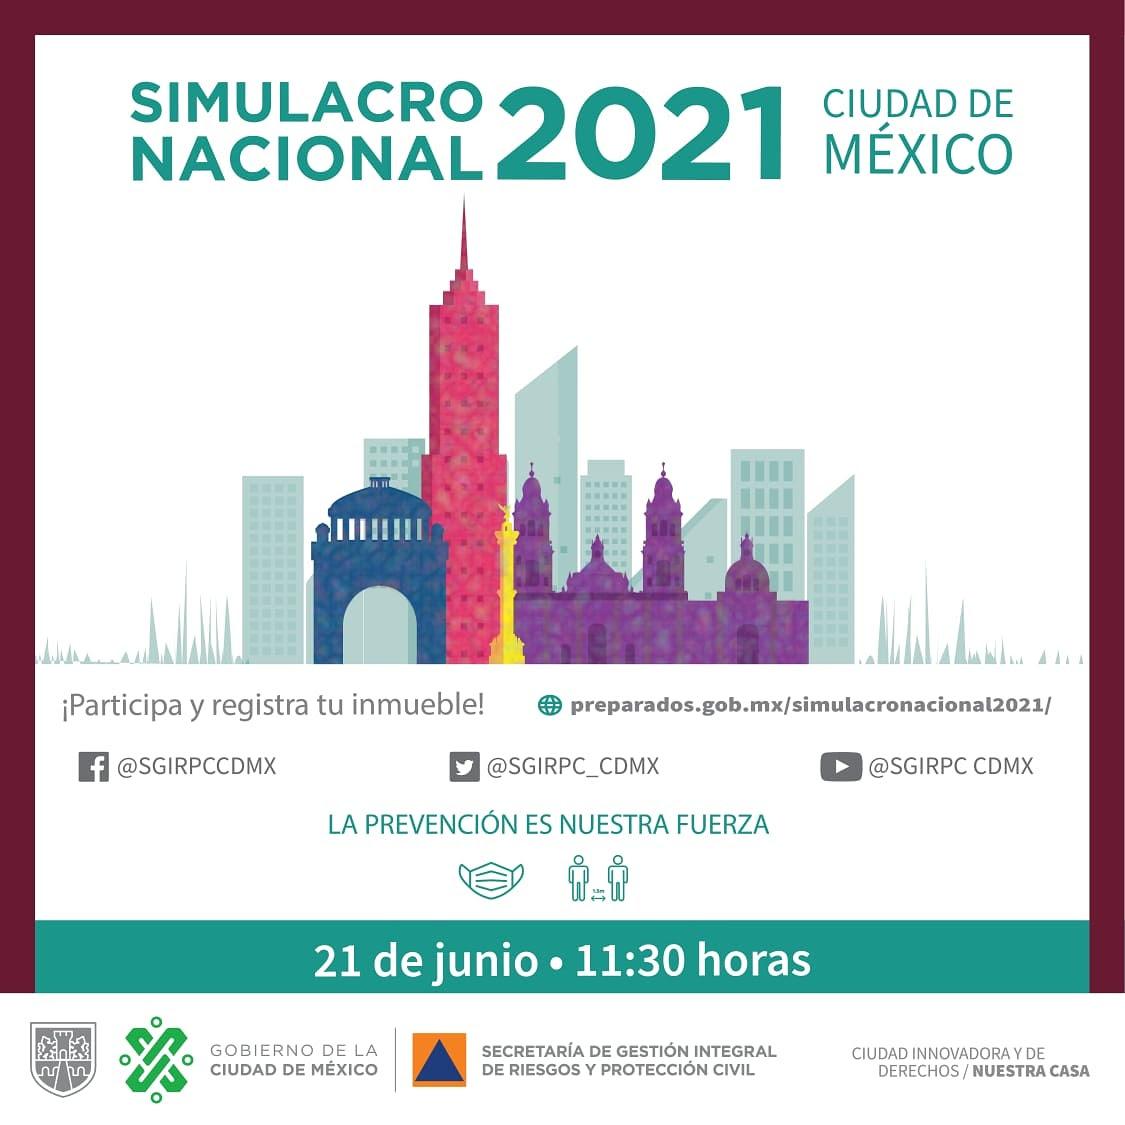 SIMULACRO NACIONAL 2021